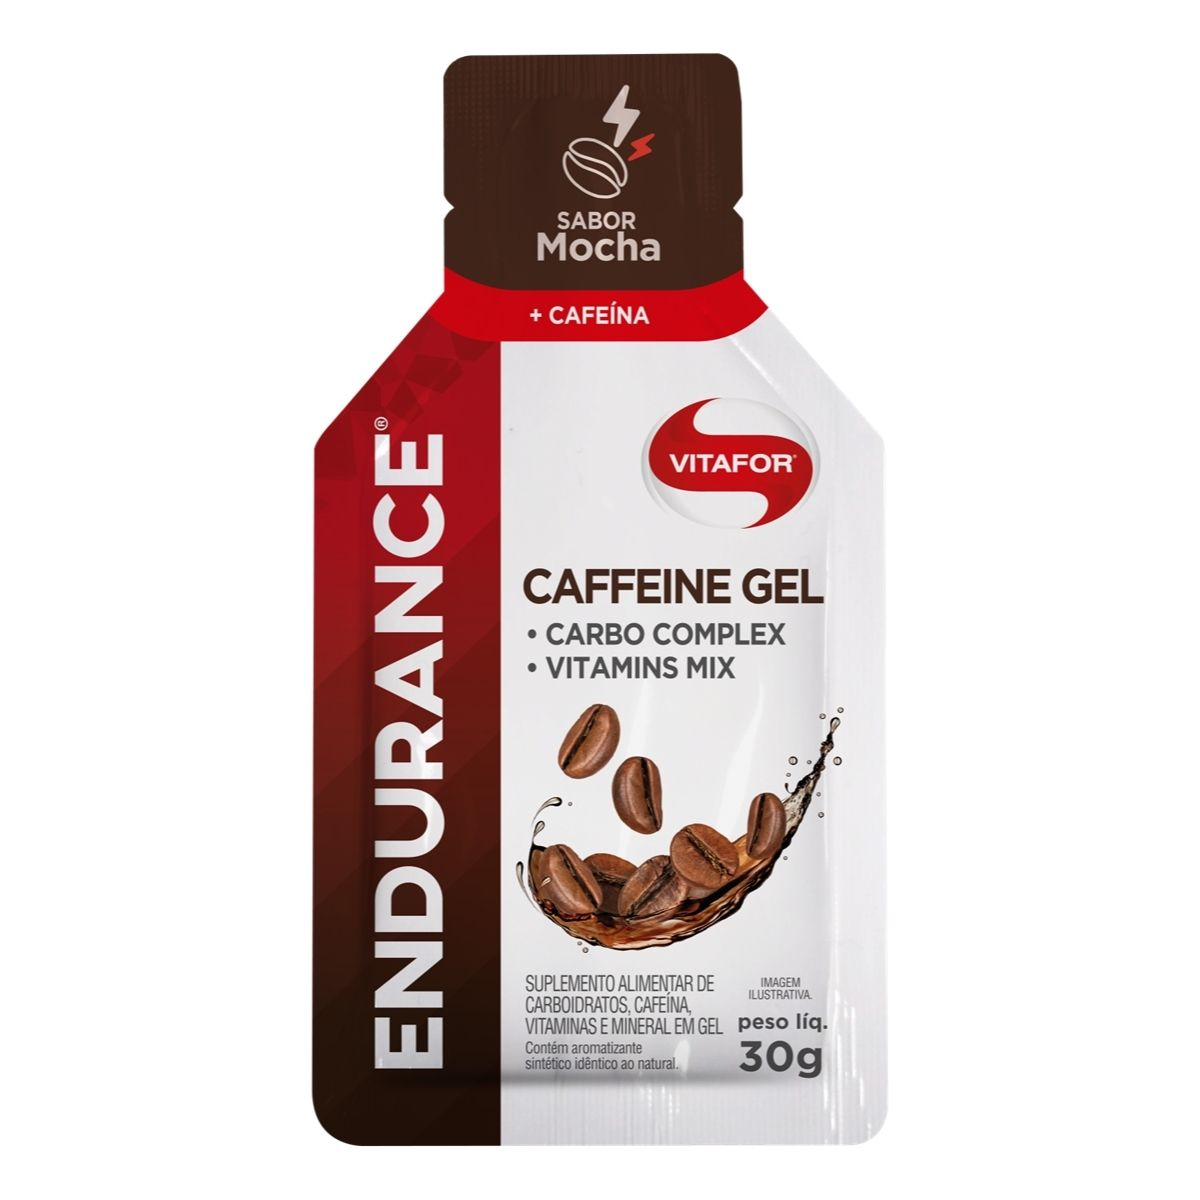 ENDURANCE CAFFEINE GEL SACHE 30G MOCHA VITAFOR